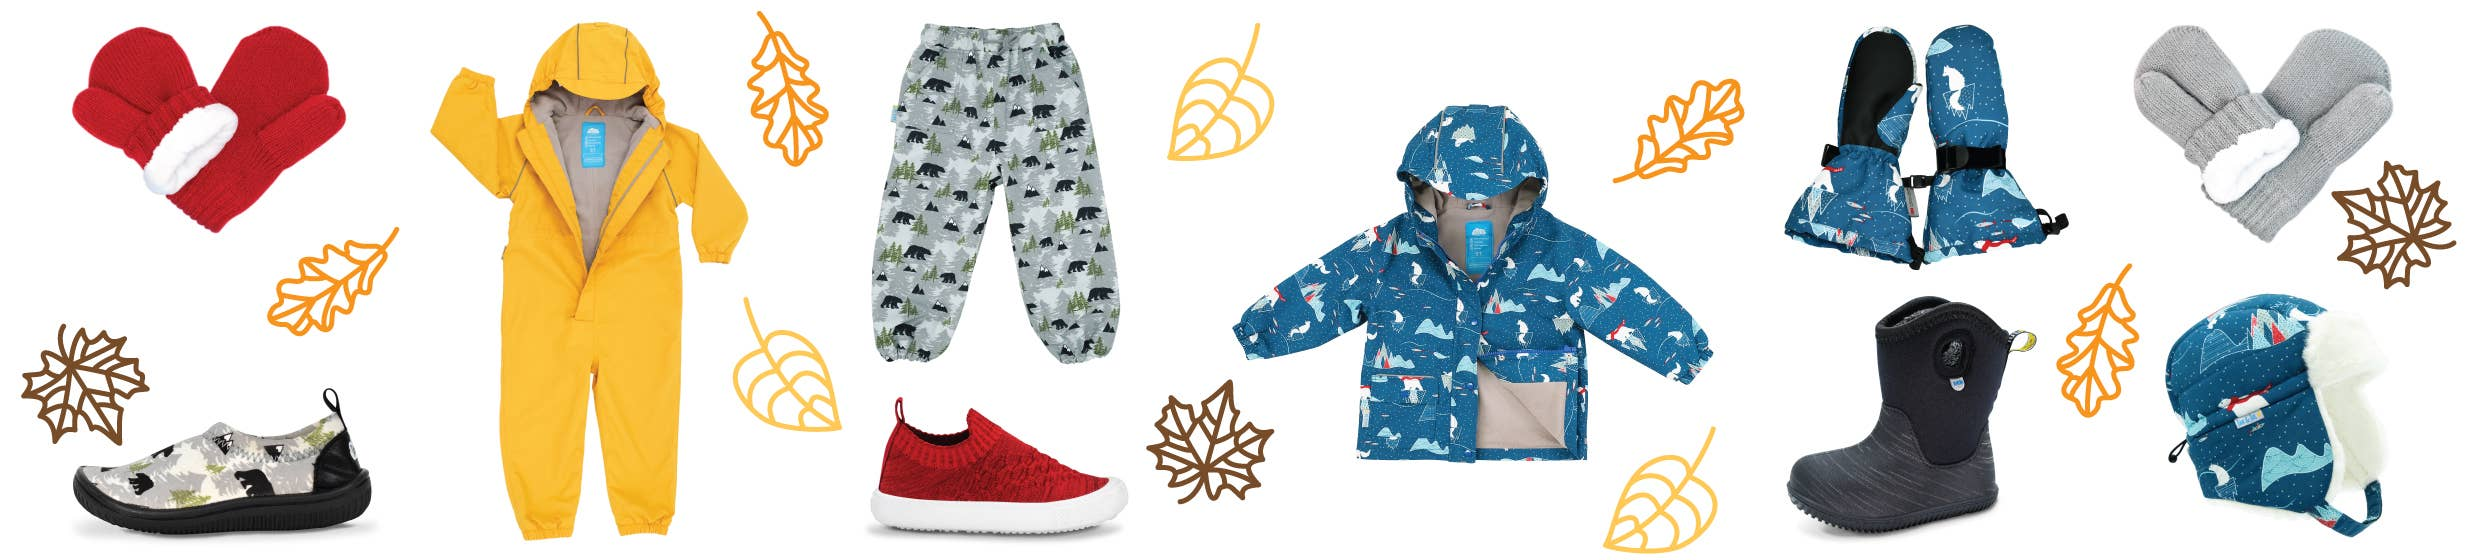 Baby//Toddler//Little Kid JAN /& JUL Kids Play Shoes